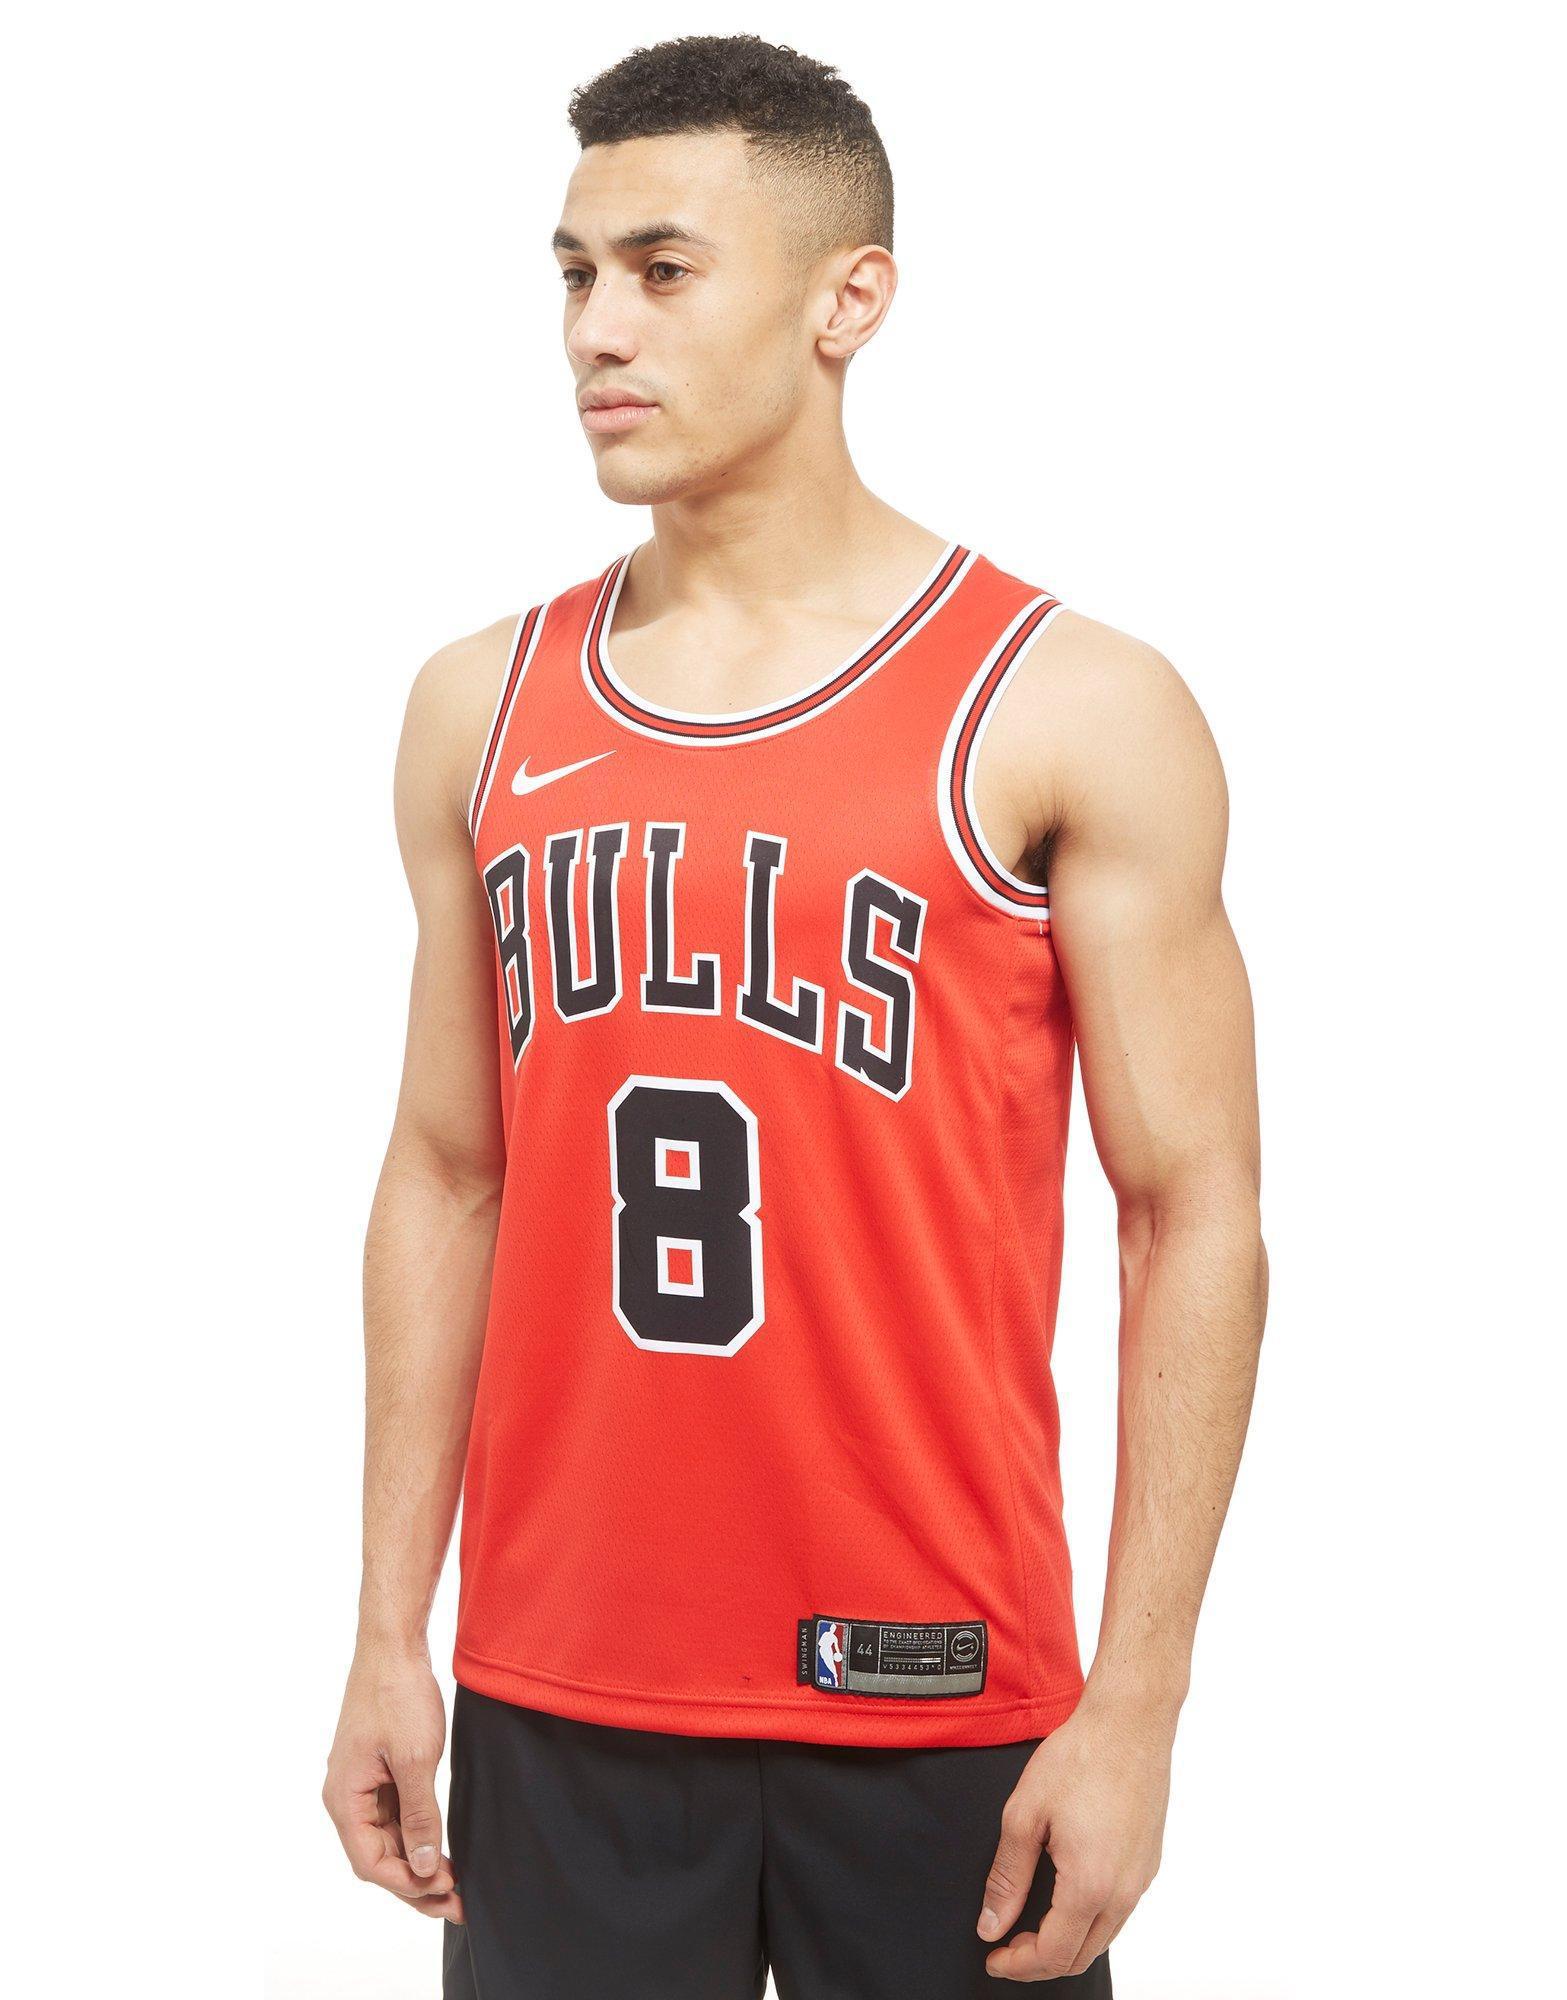 3589a04b3 Nike Nba Chicago Bulls Swingman Lavine Jersey in Red for Men - Lyst